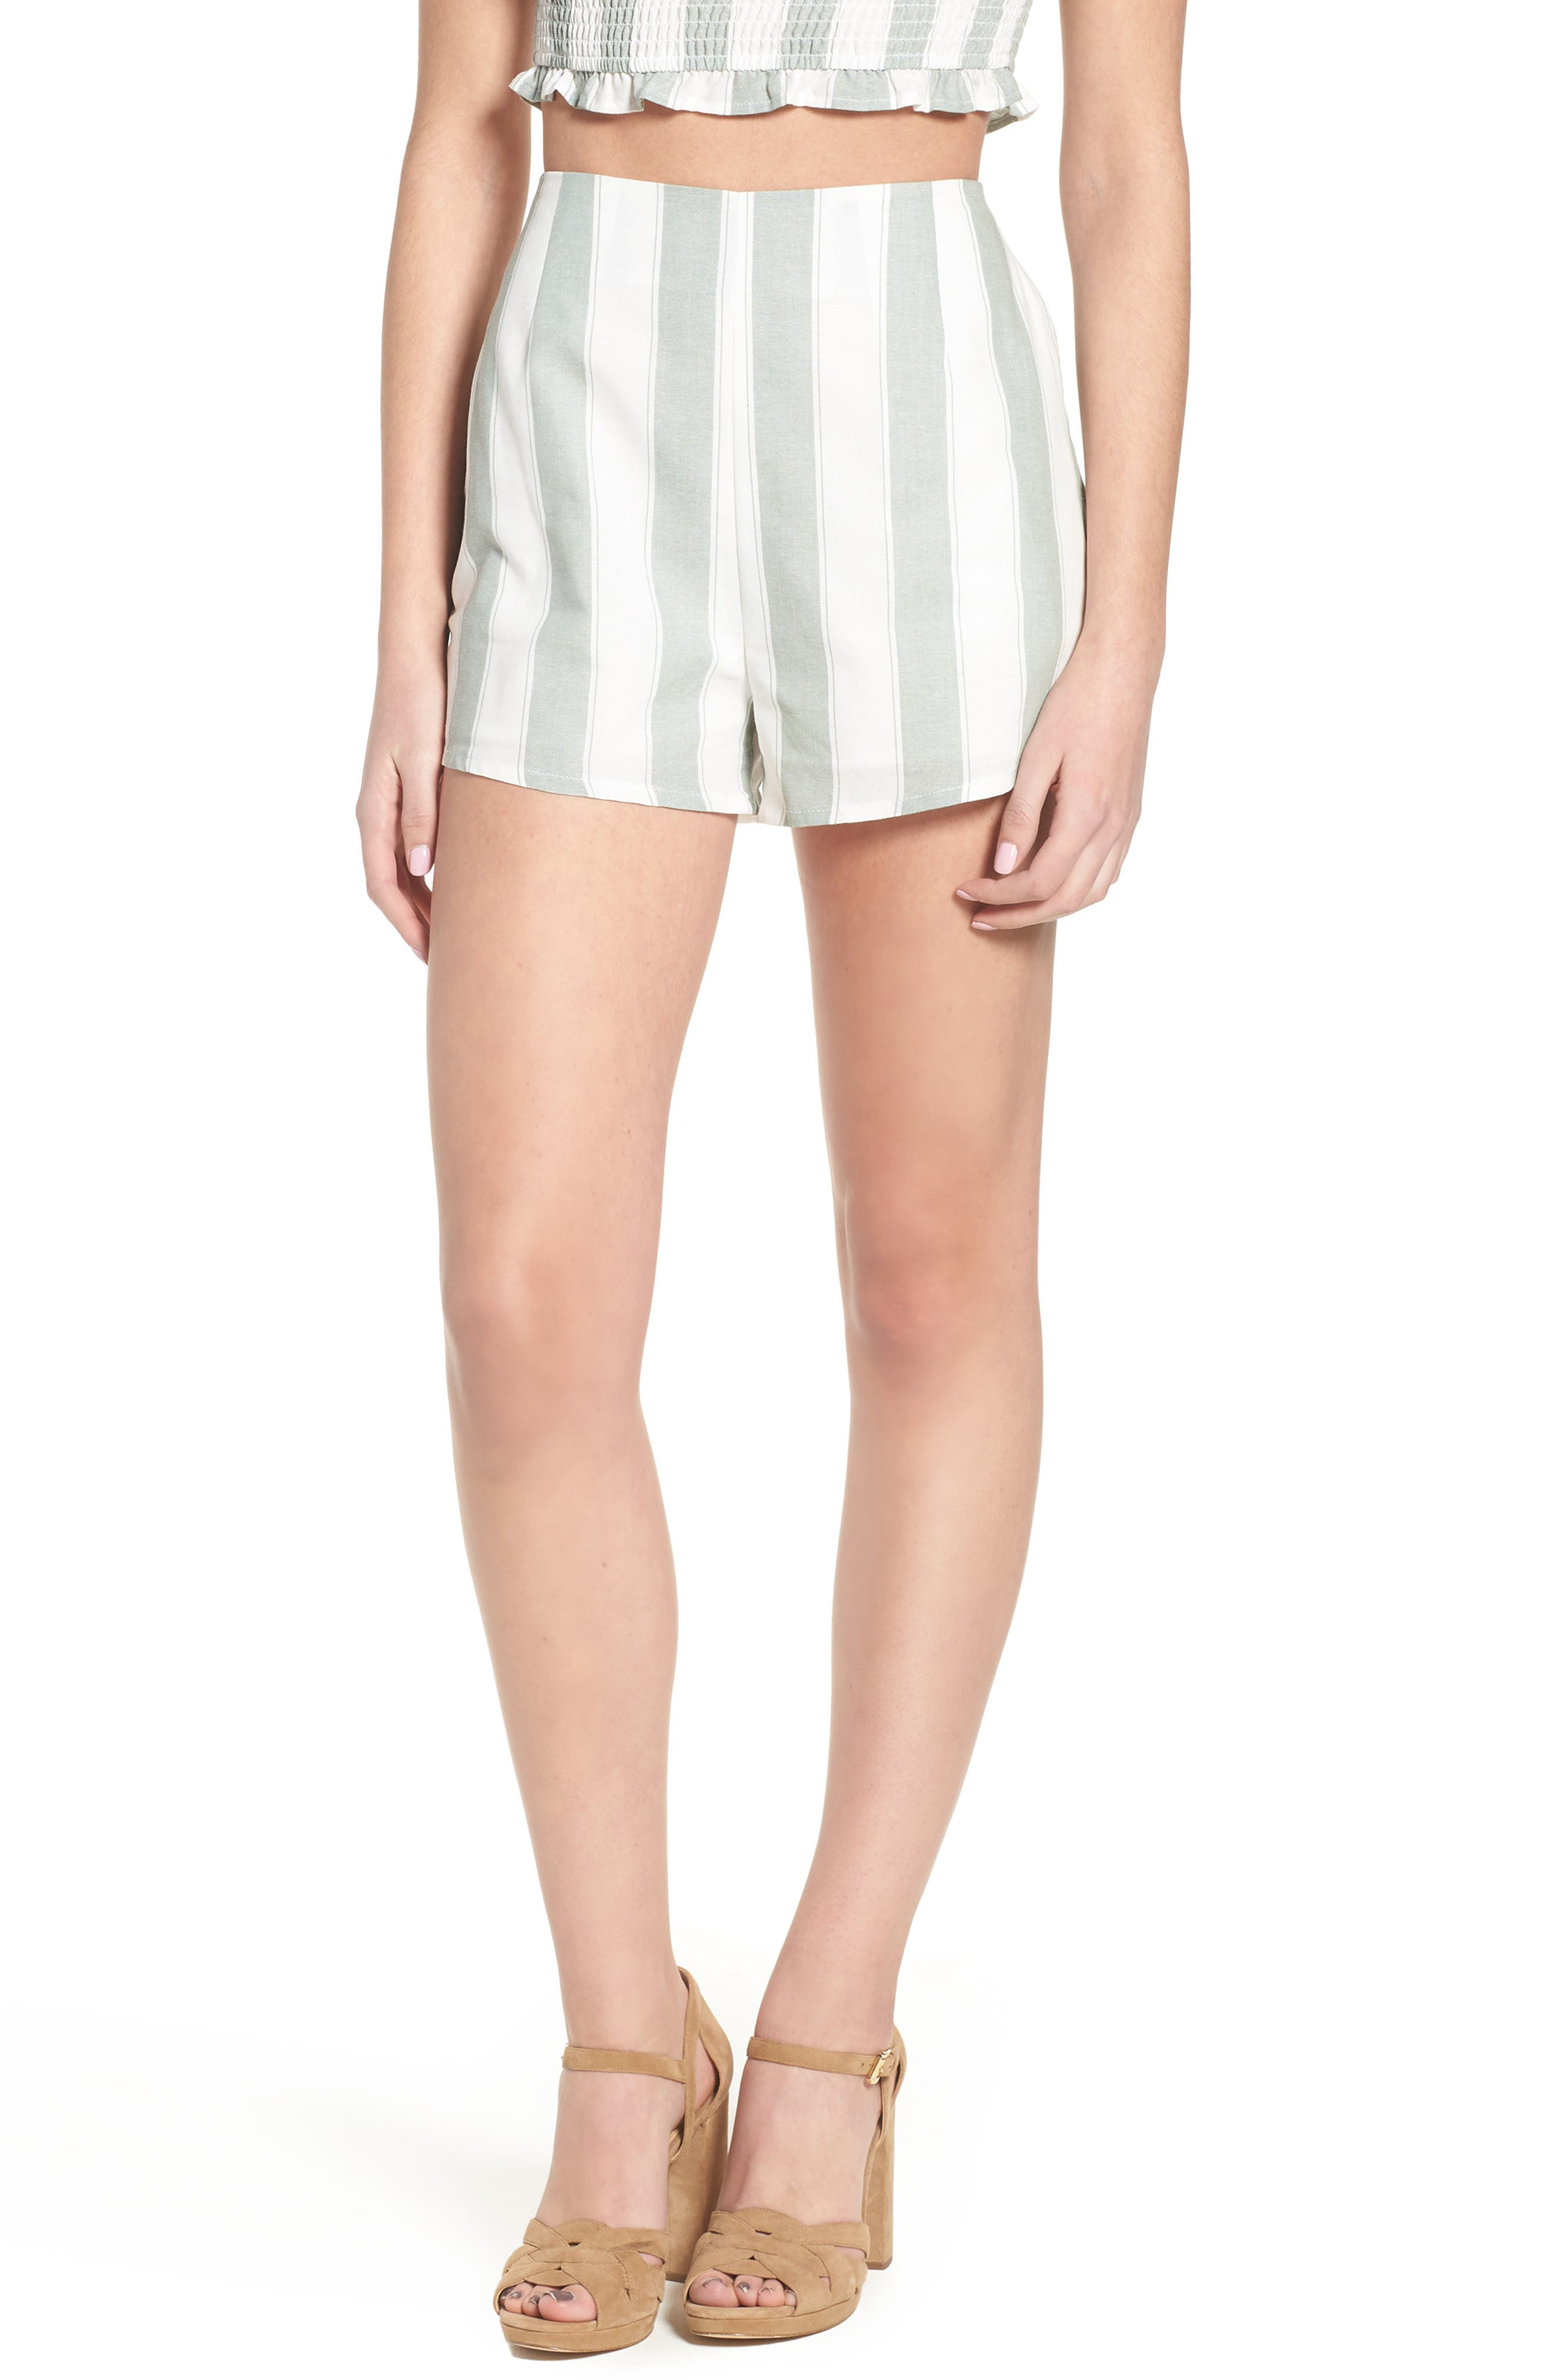 Poetic Stripe Shorts,                         Main,                         color, 105